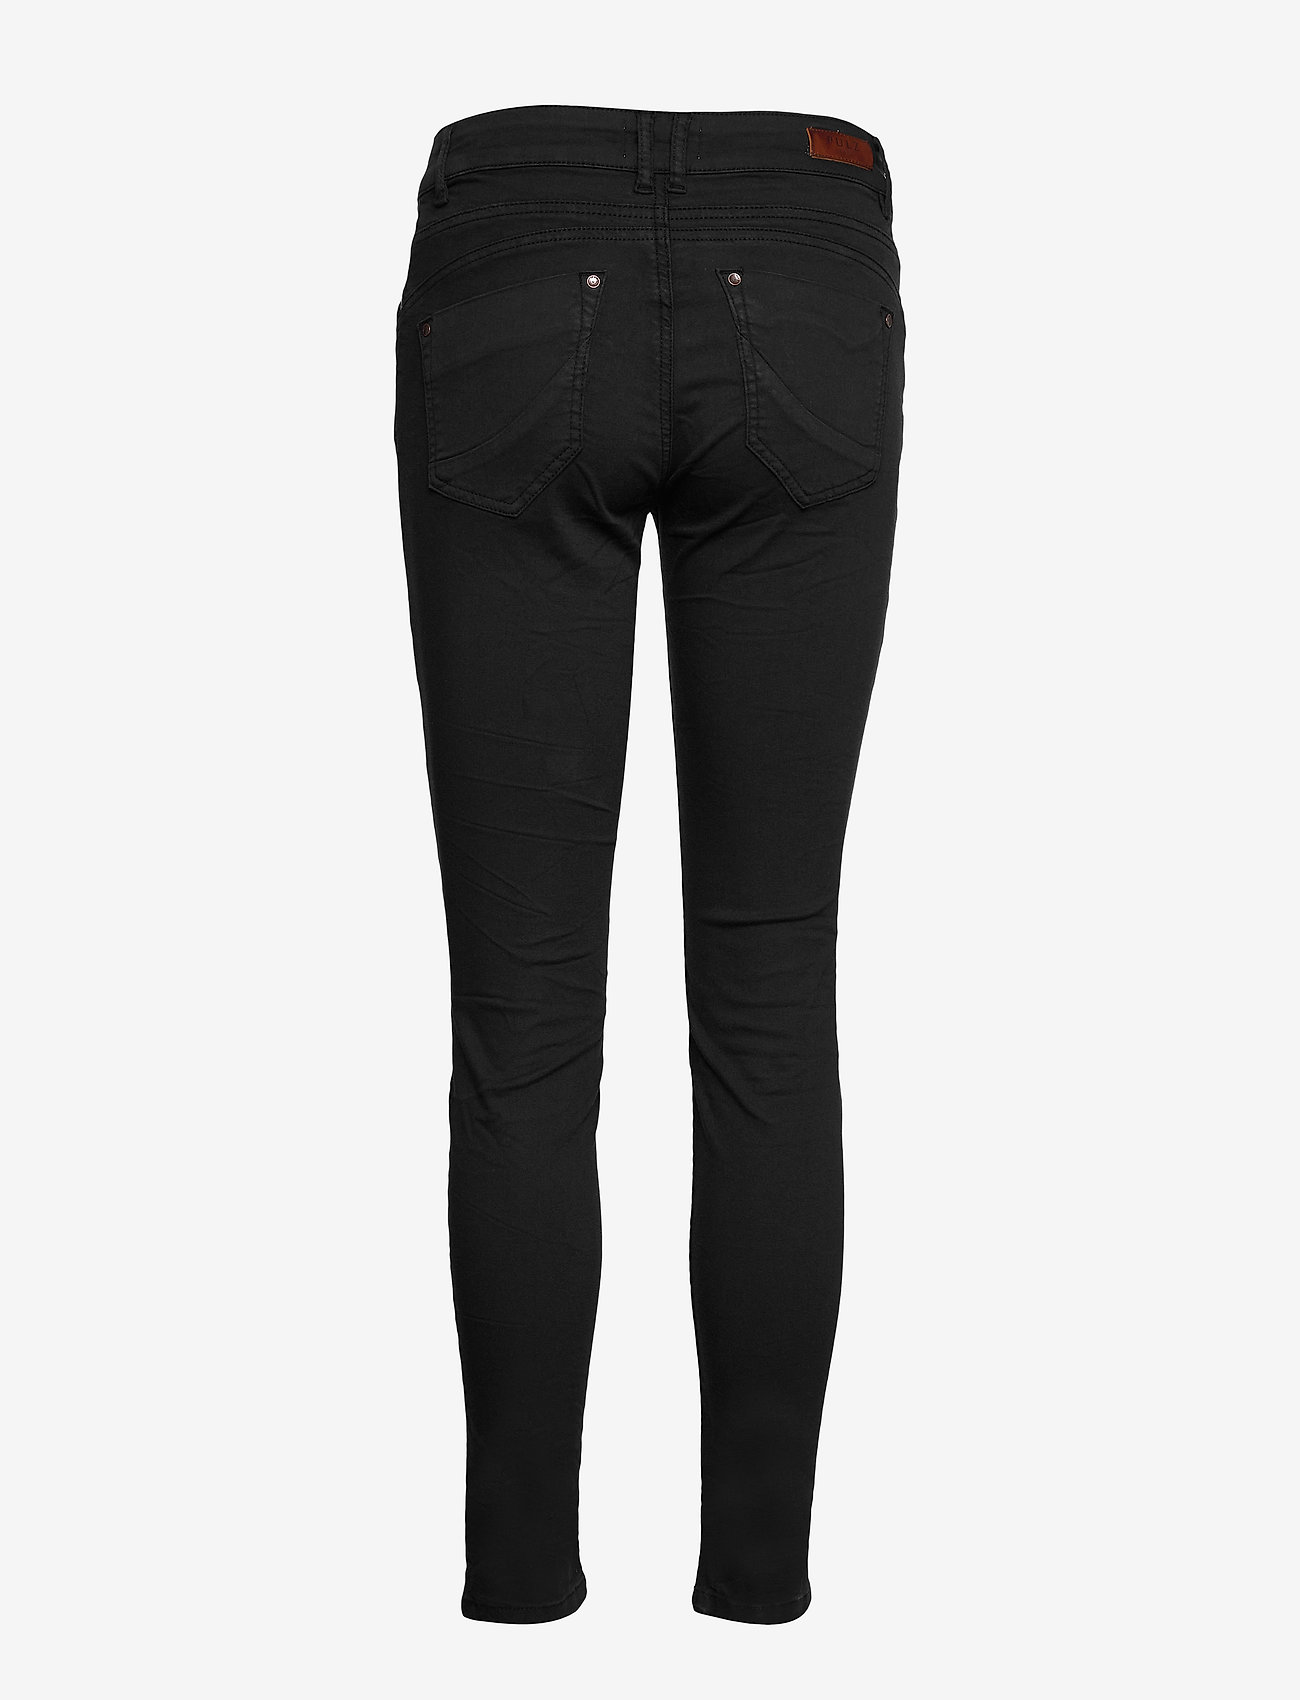 Pulz Jeans - PZROSITA PANT - skinny jeans - black beauty - 1